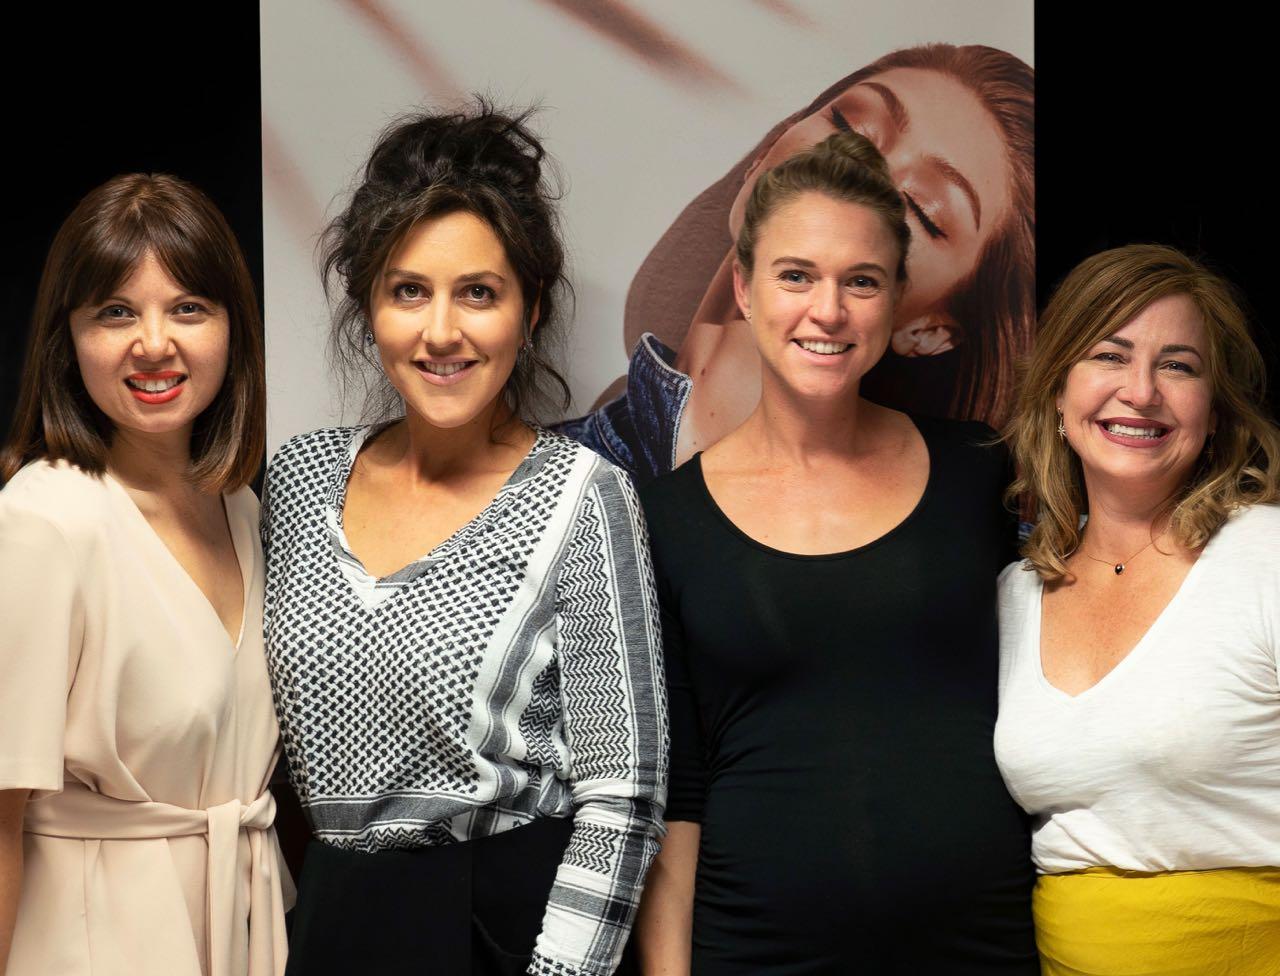 Maybelline New York Appoints McCann Melbourne as Digital Agency